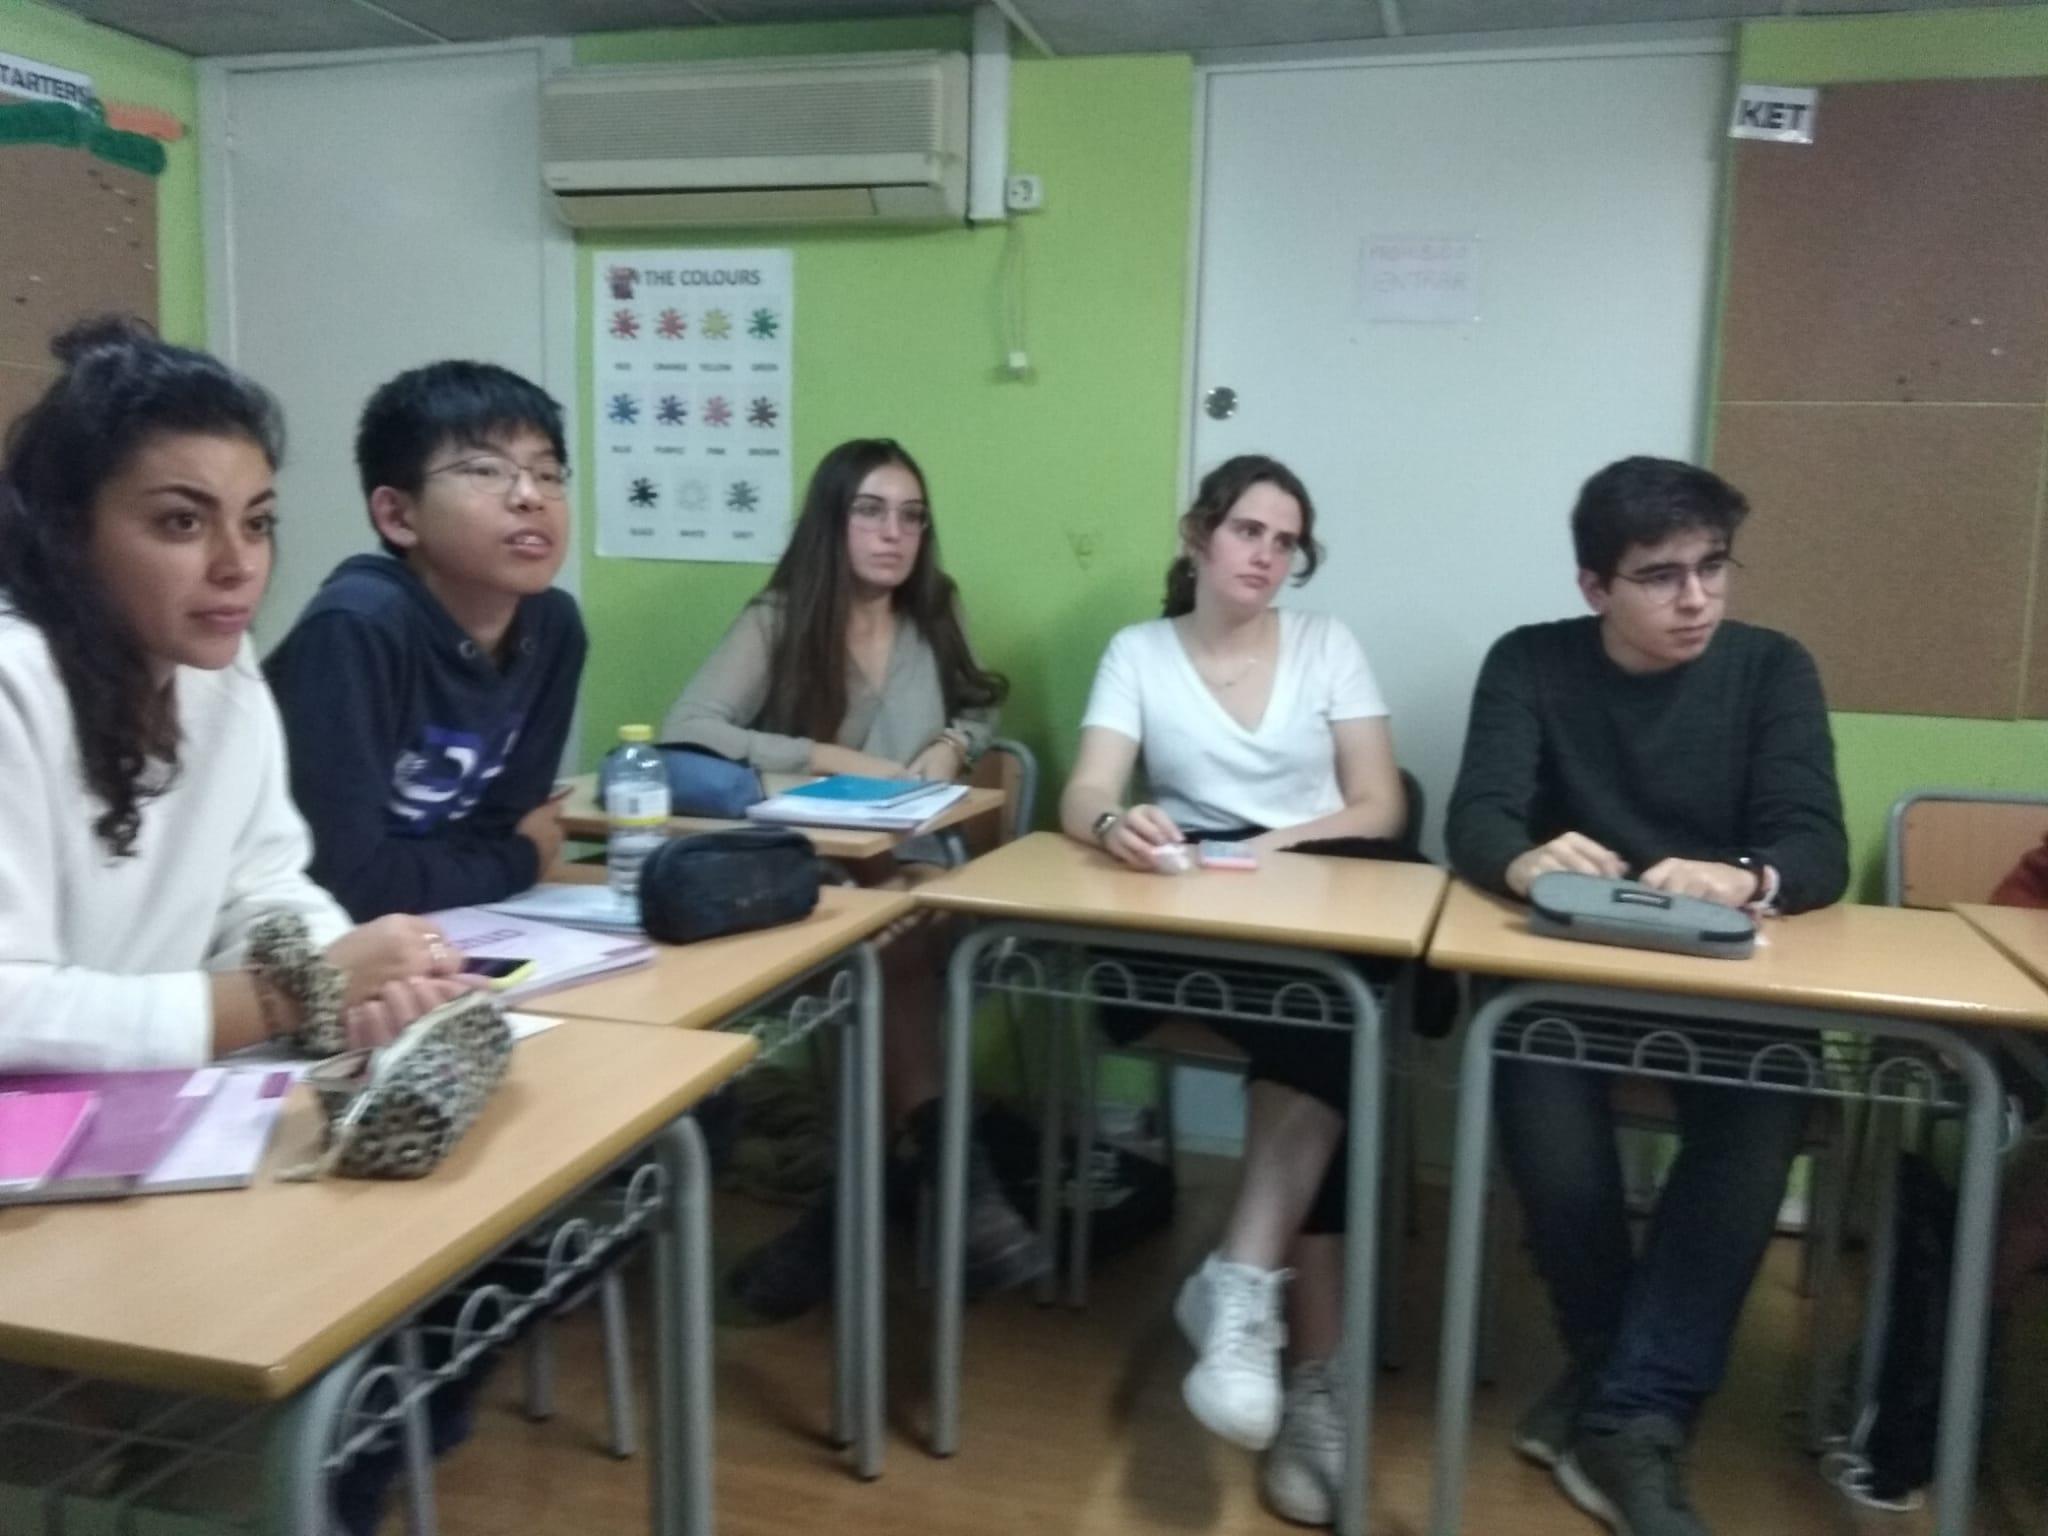 Resumen CAE 1 mes de Octubre 2019 – Centro Baleares